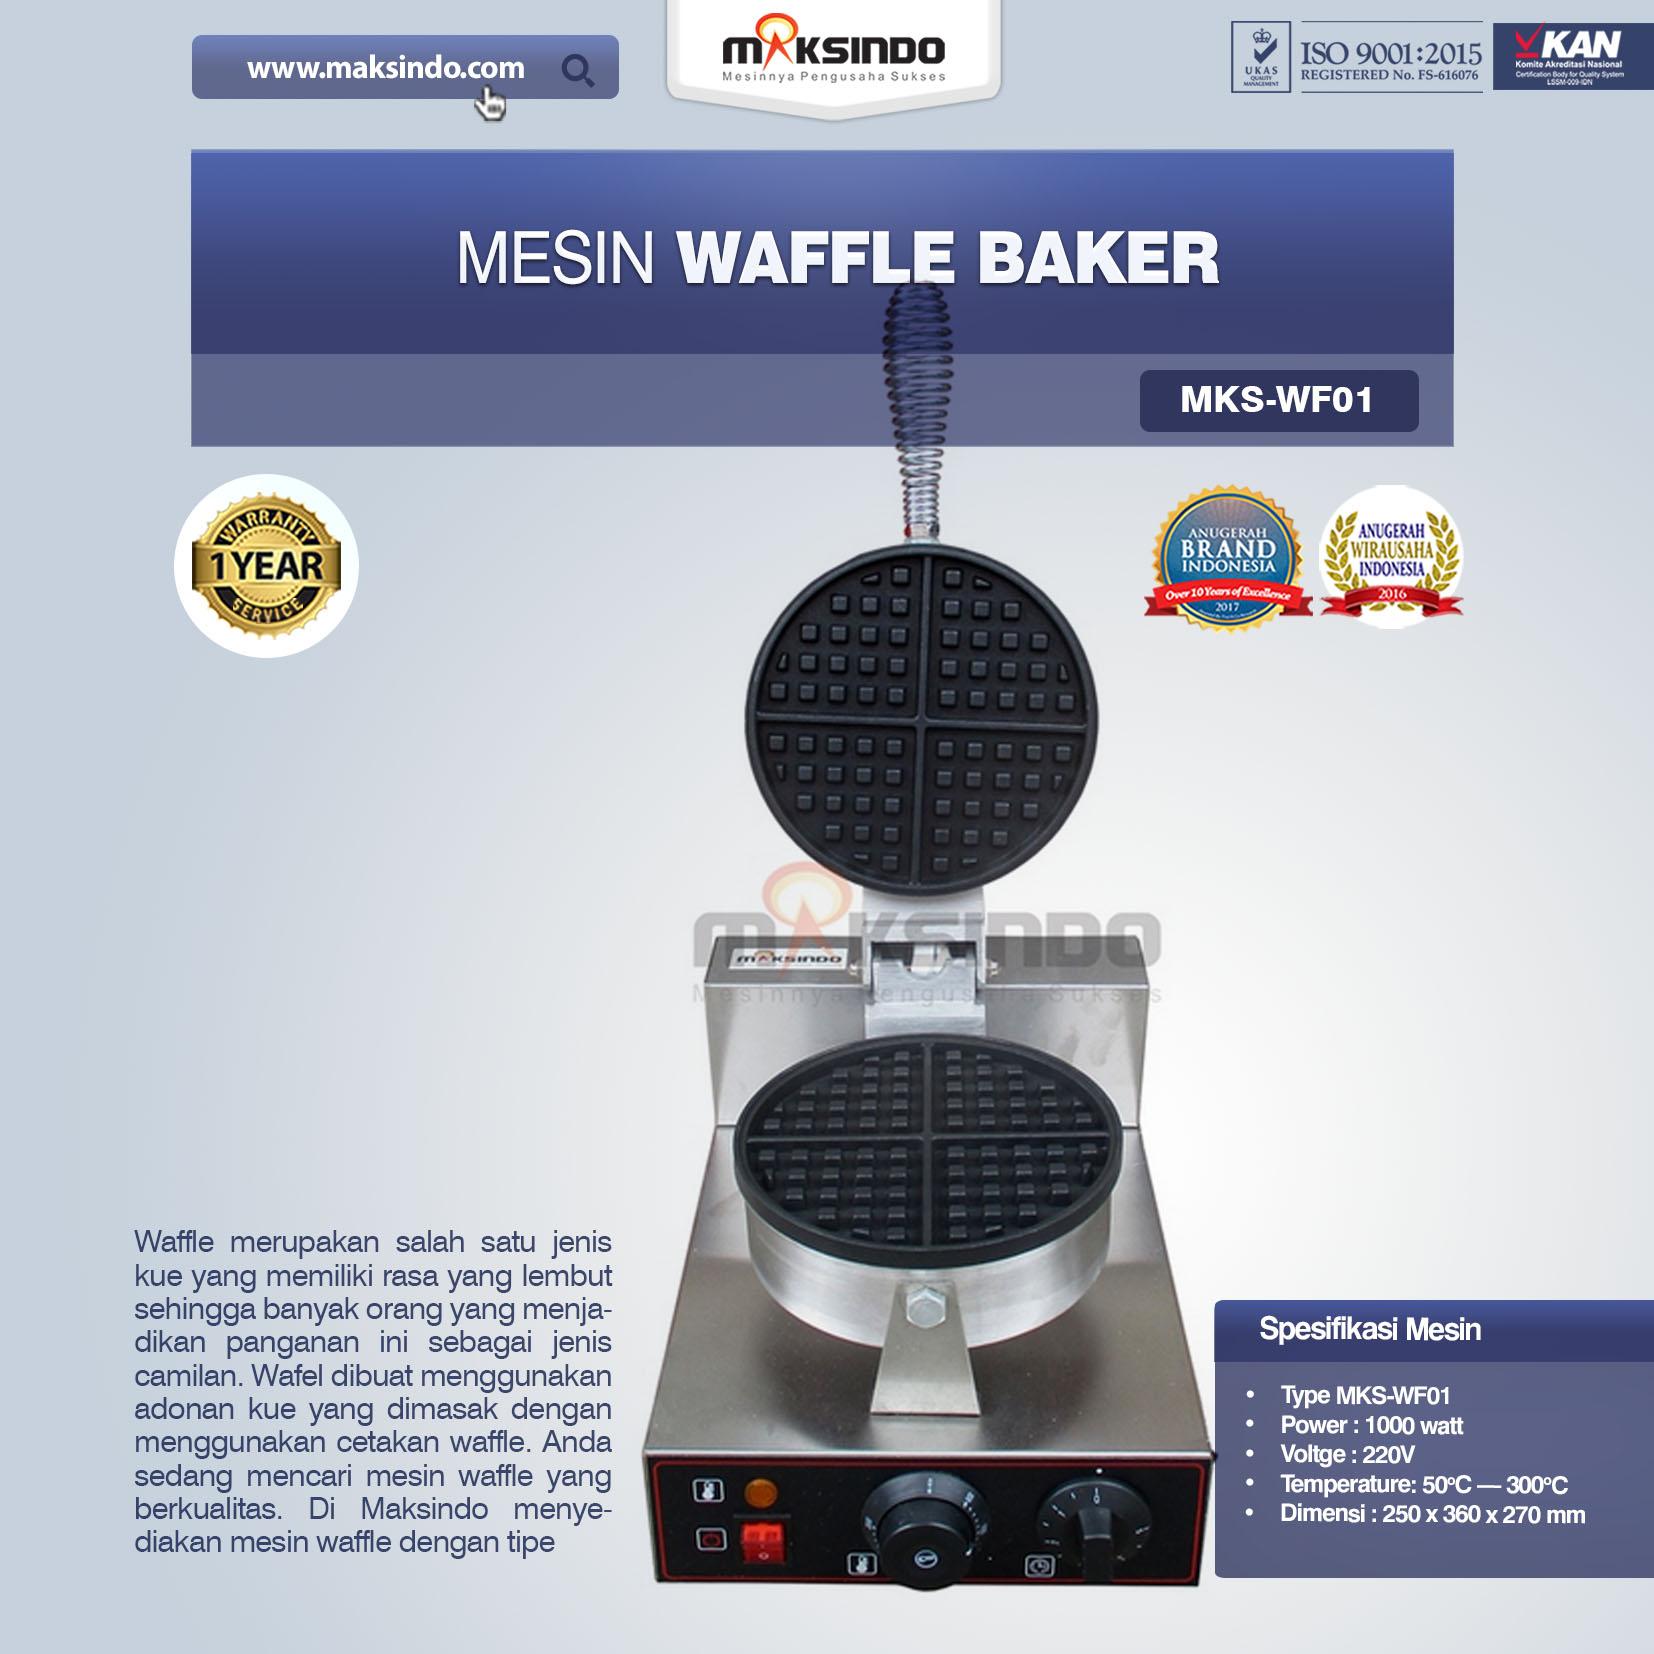 Mesin-Waffle-Baker-MKS-WF01